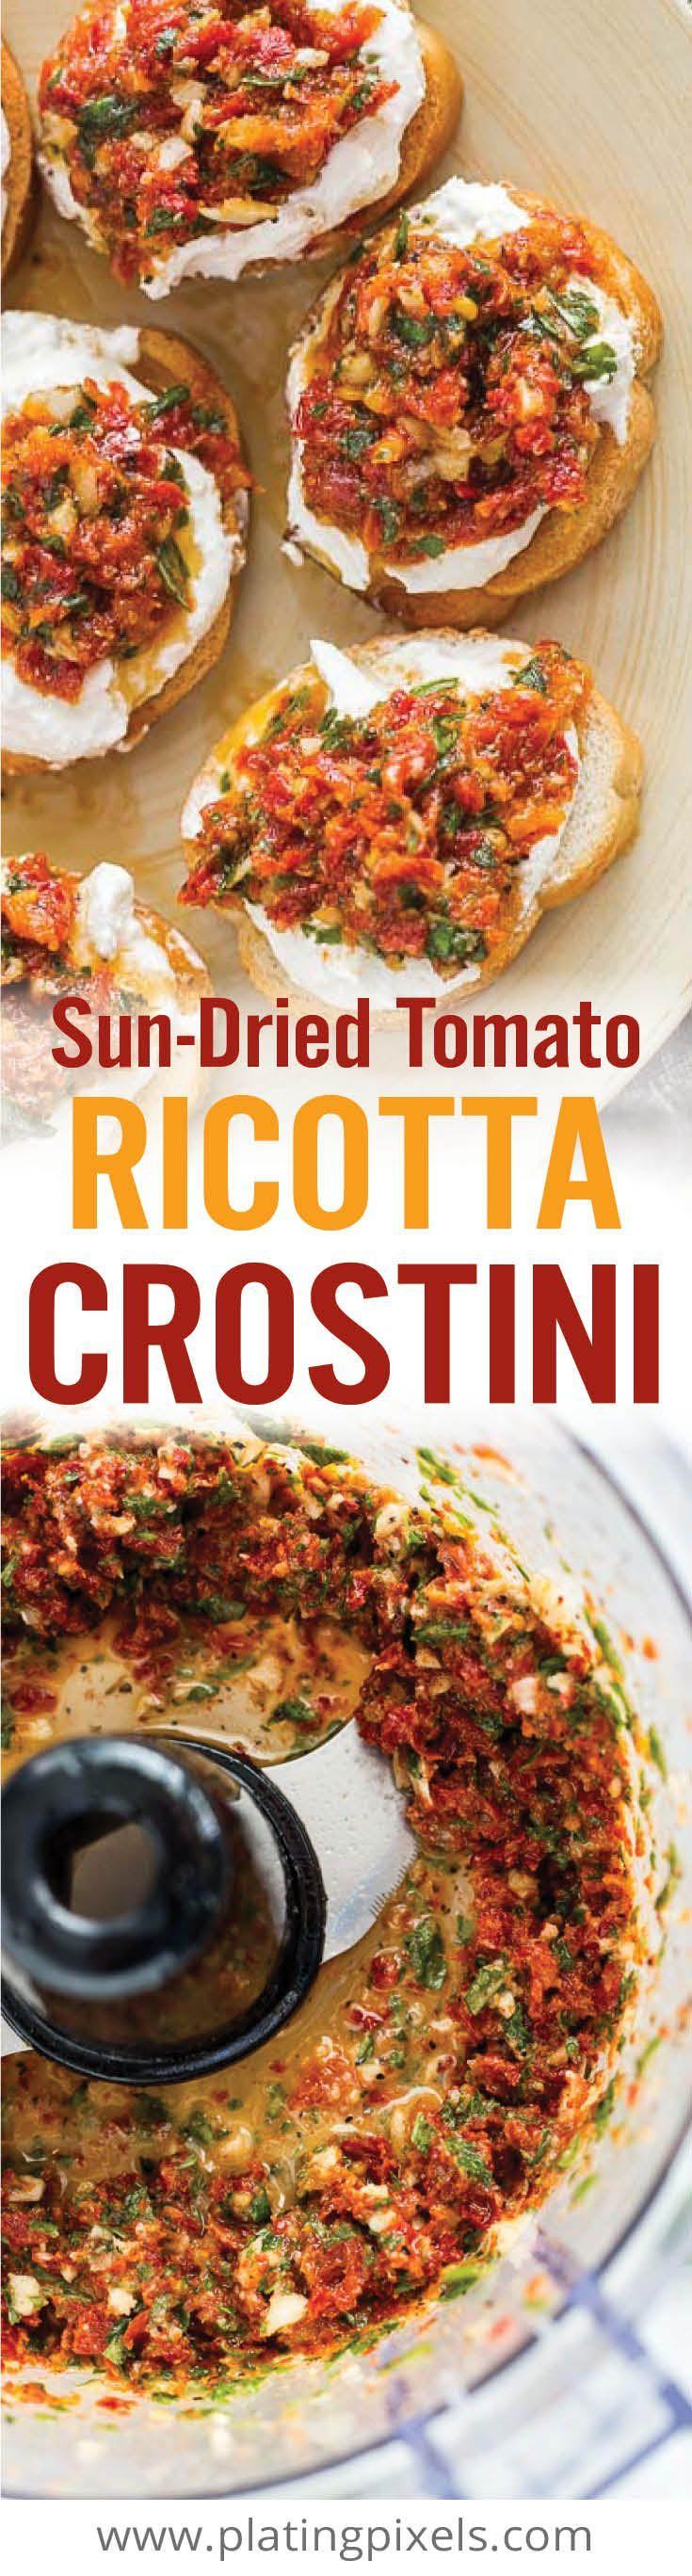 Msg 4 21+ Quick Sun-dried Tomato Ricotta Crostini party appetizer recipe. Sun-dried tomato, basil, garlic, pepper and ricotta over crispy crostini pieces. [ad] @warsteinerusa #RefreshinglyIndependent - www.platingpixels.com